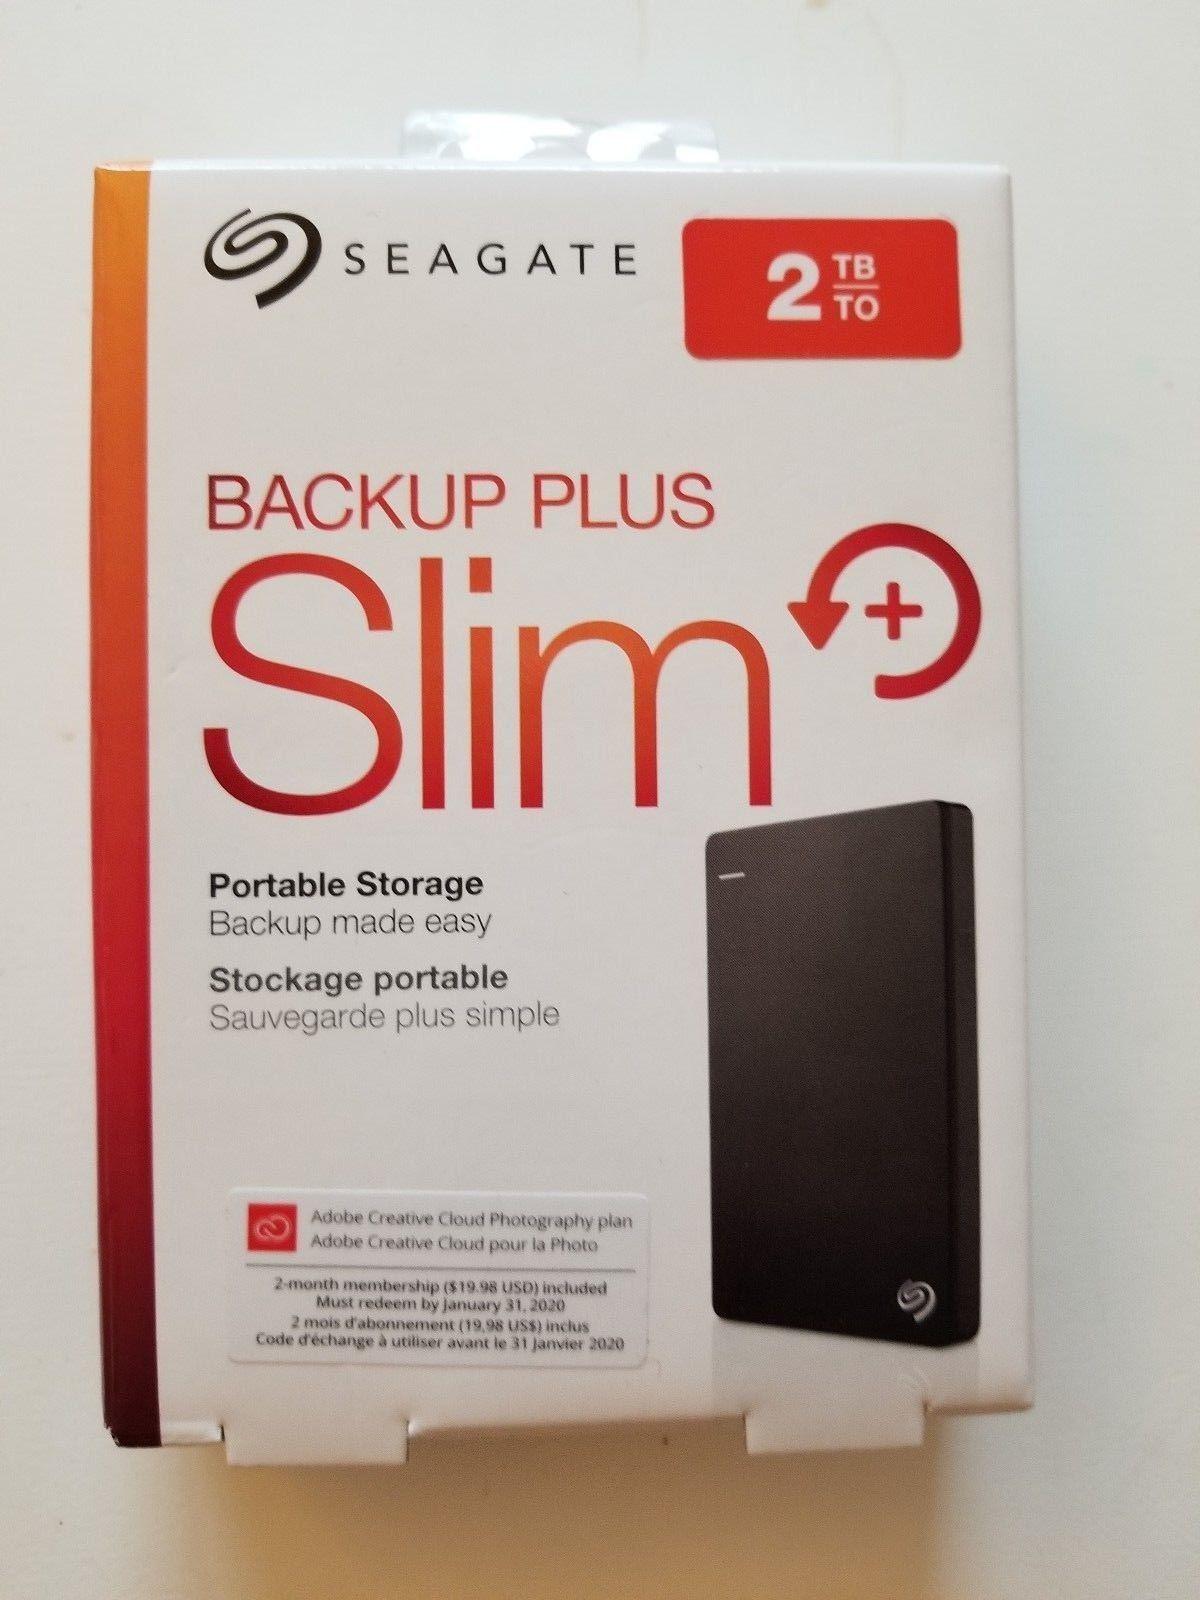 Seagate Backup Plus Slim 2TB Portable USB 3.0 External Hard Drive STDR2000100